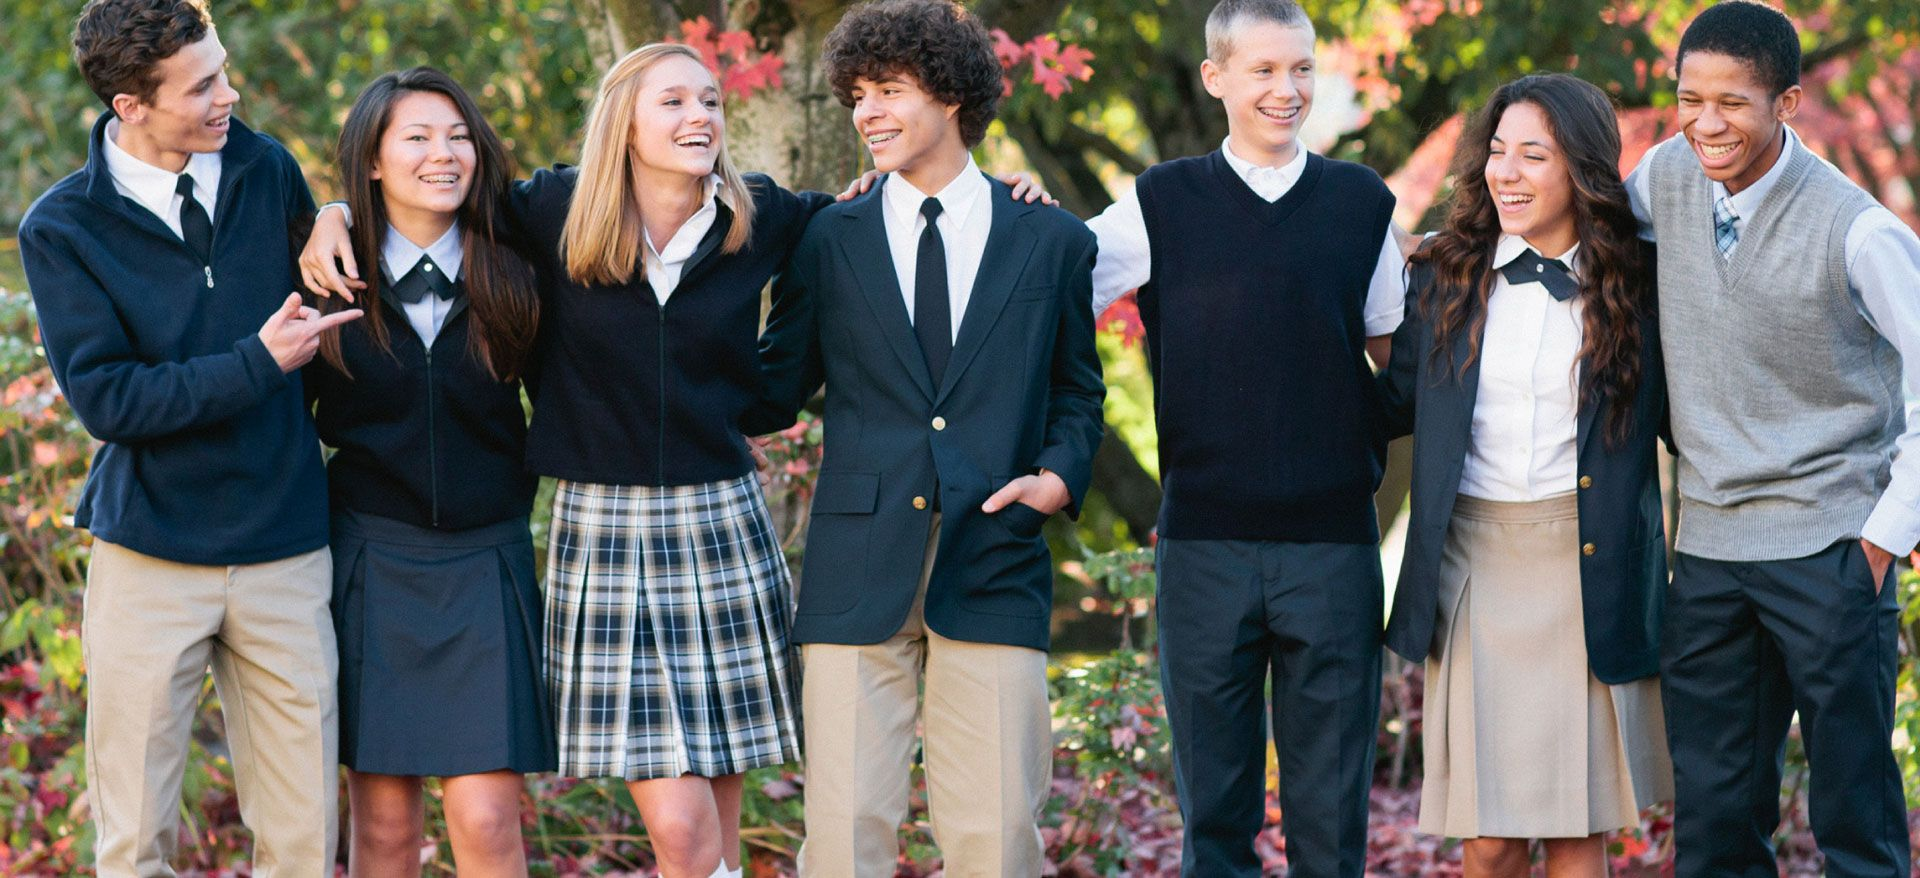 DENNIS School Uniforms | School Uniform Manufacturer and